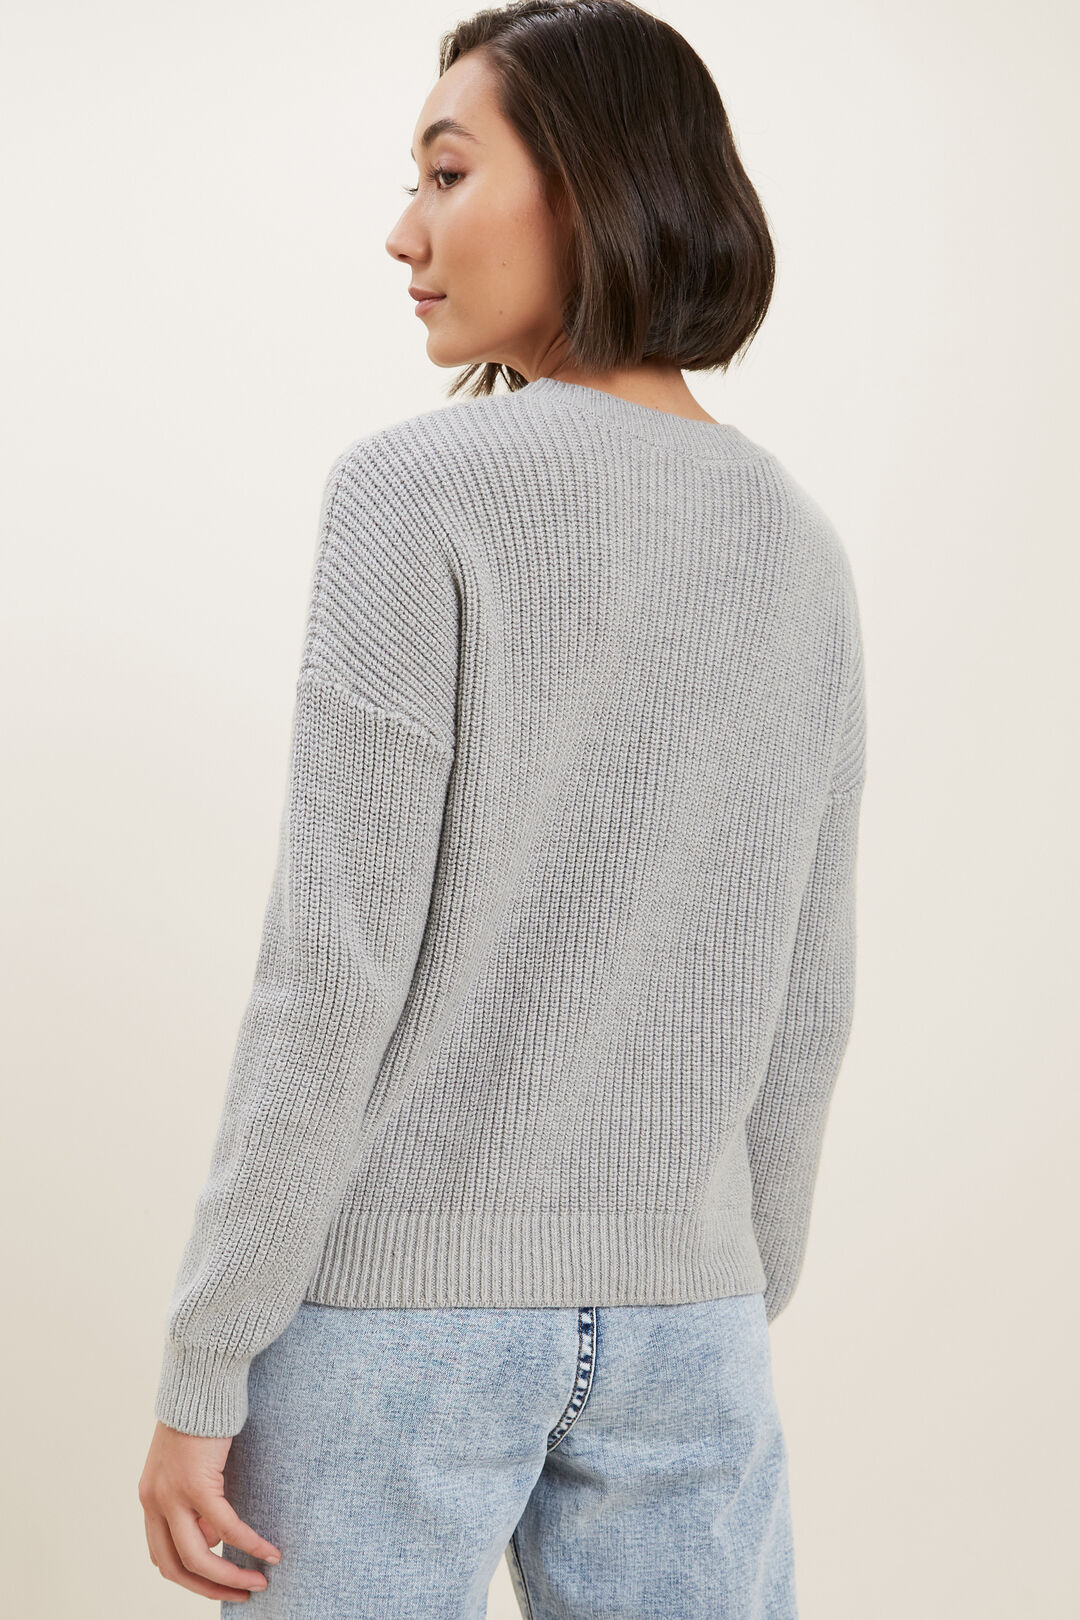 Fisherman Knit Sweater  Dim Grey Marle  hi-res